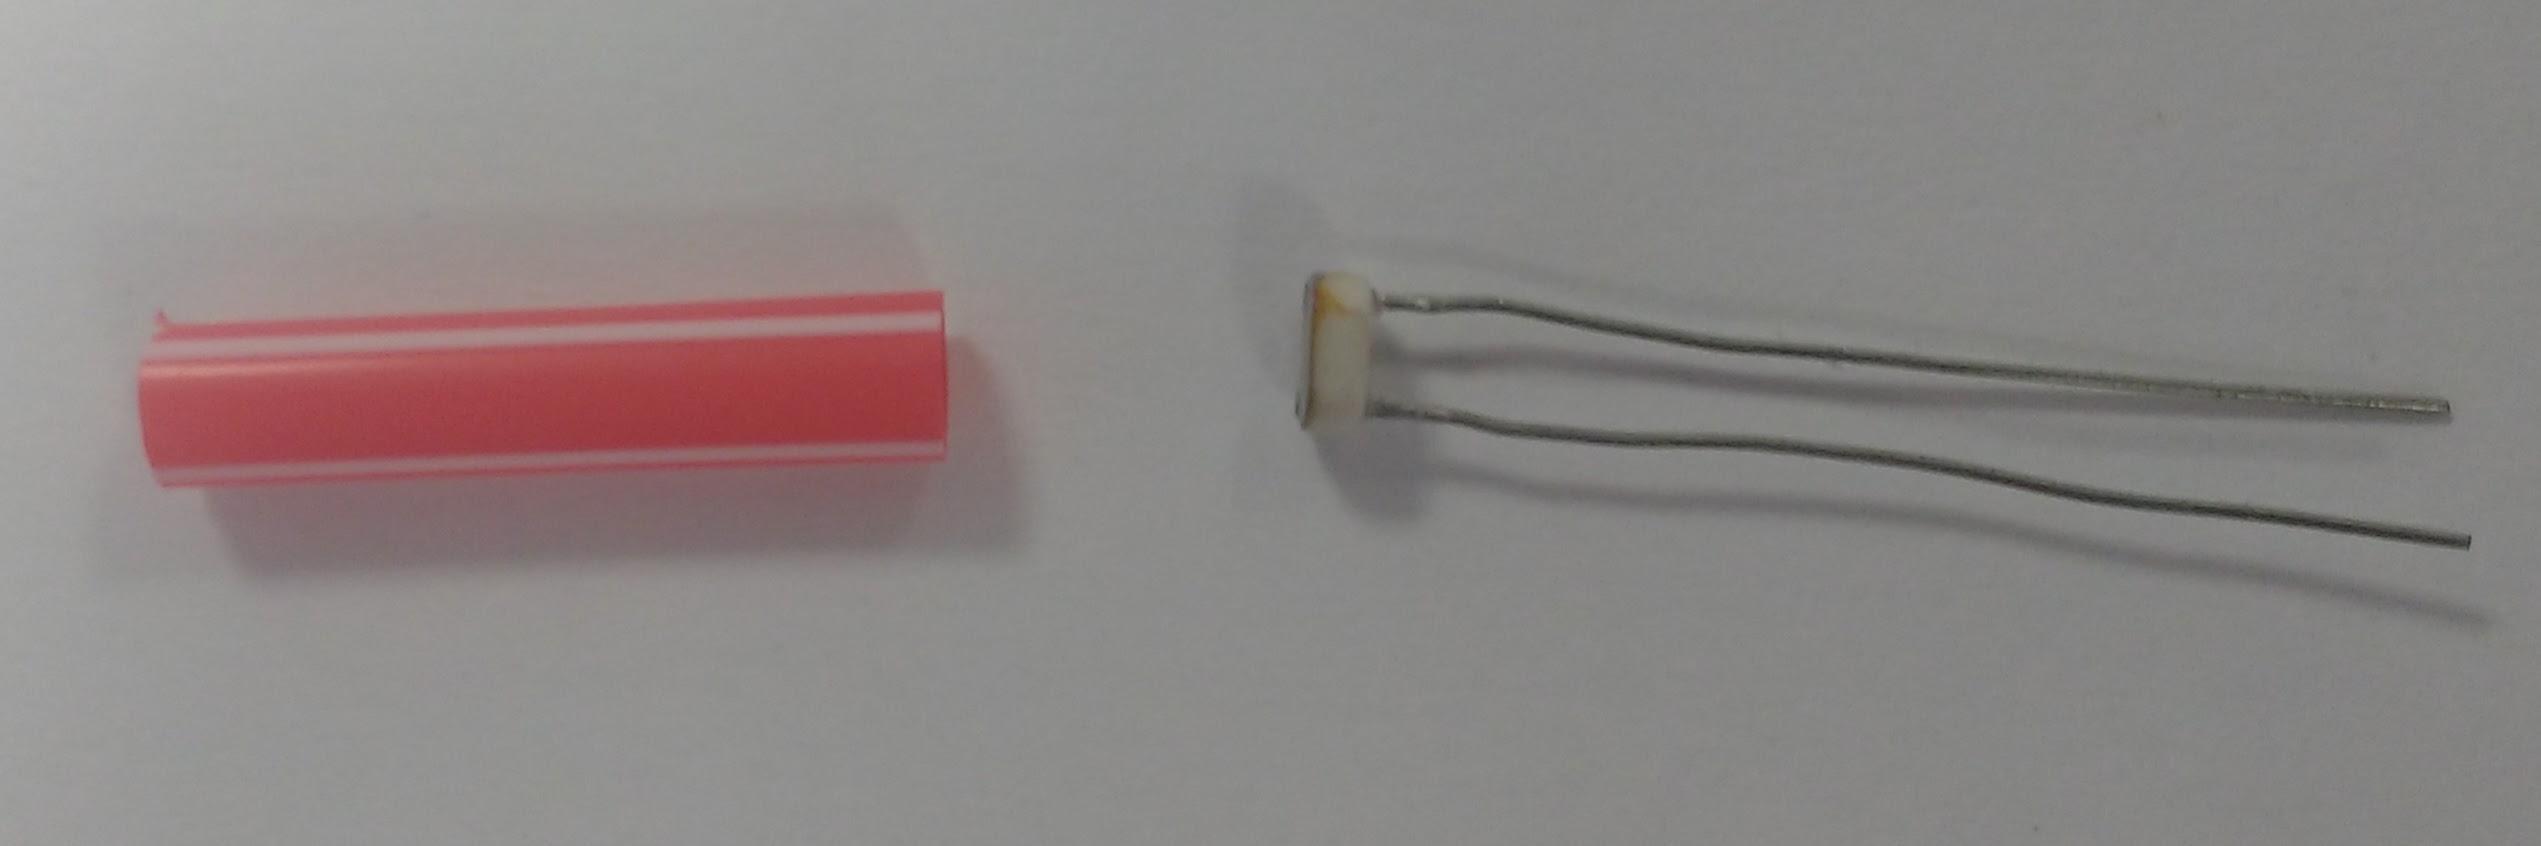 A Raspberry Pi laser tripwire - Detecting a broken beam | Raspberry ...